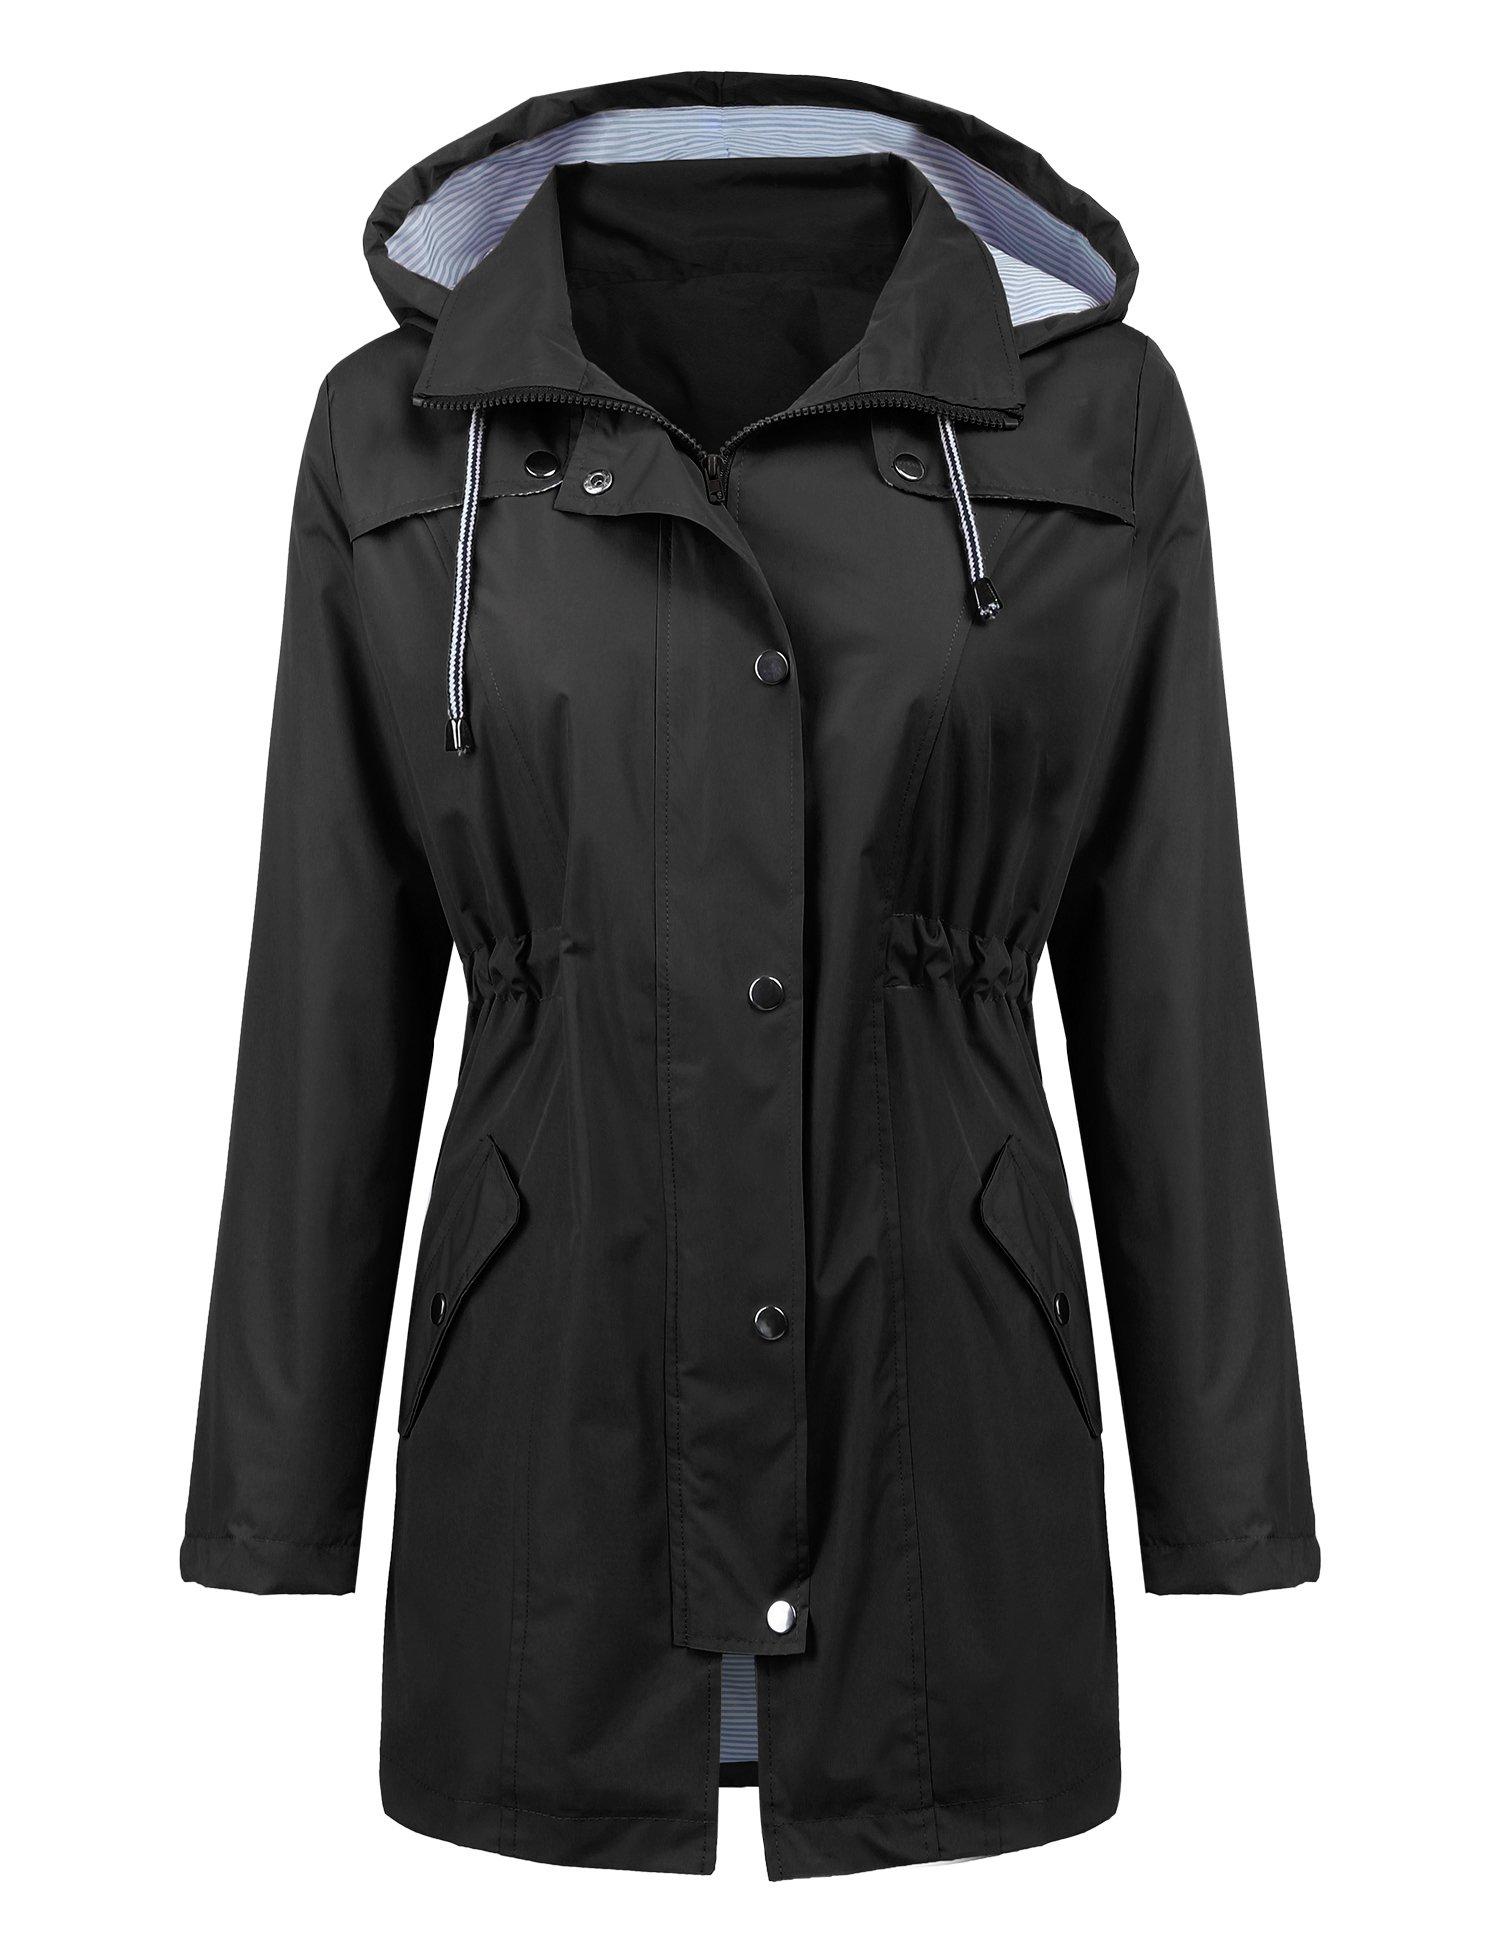 Women Rain Jacket Belted Adjustment Hooded Long Lightweight Packable Outerwear Waterproof Breathable Cotton Lined Raincoat Black M by LOMON